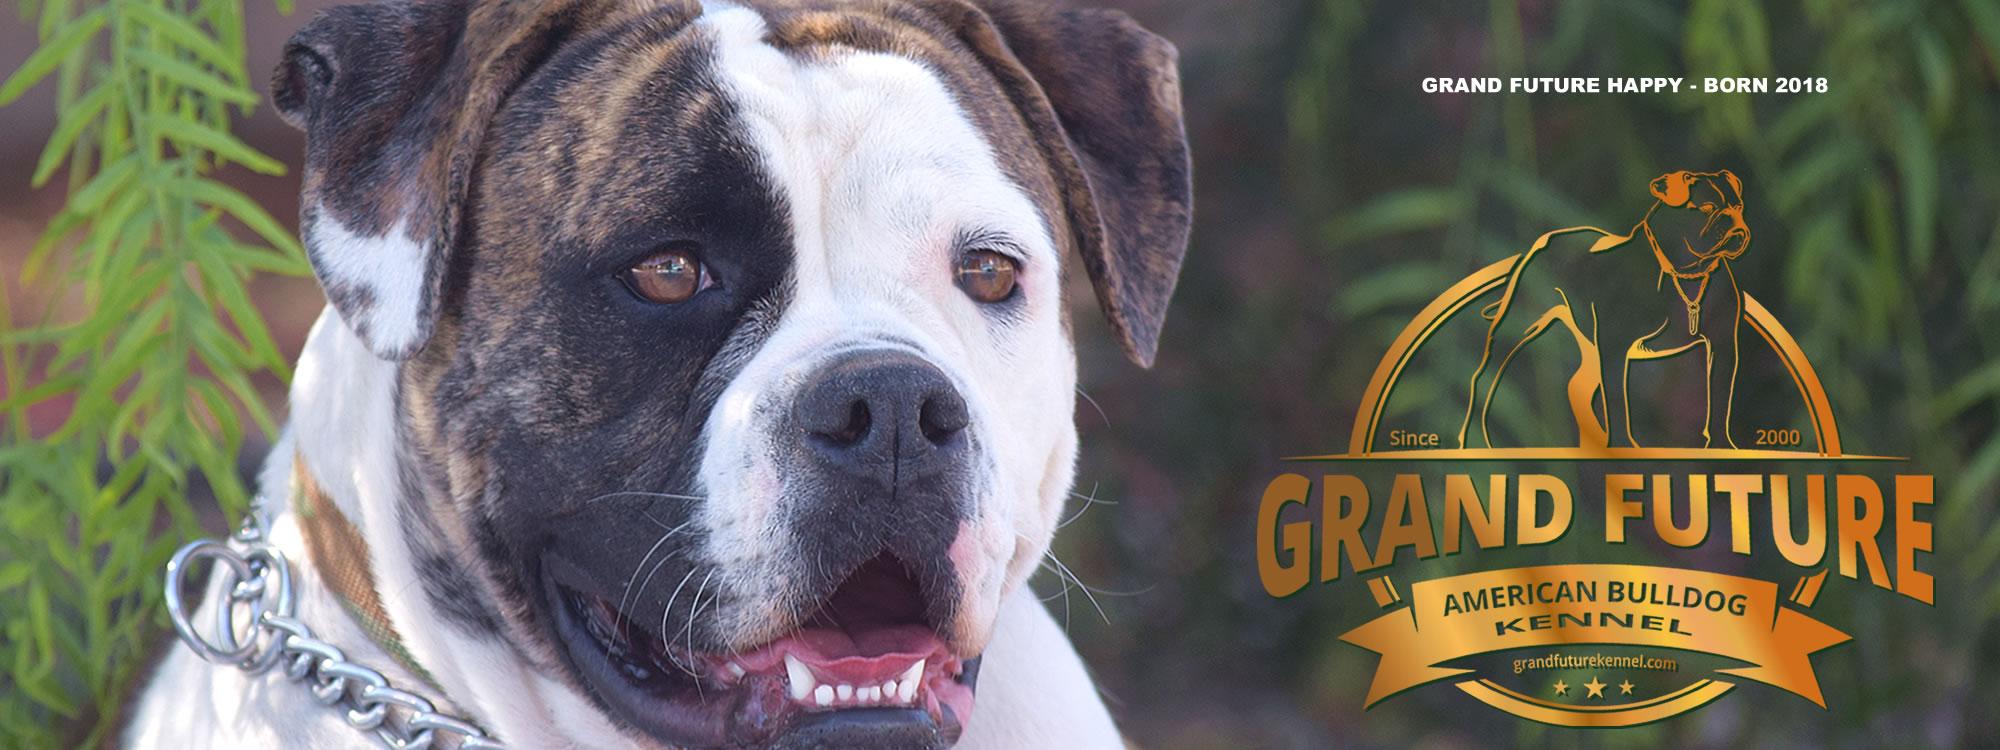 Champion Pedigree American Bulldog Puppies for Sale - GRAND FUTURE KENNEL - American Bulldog Kennel